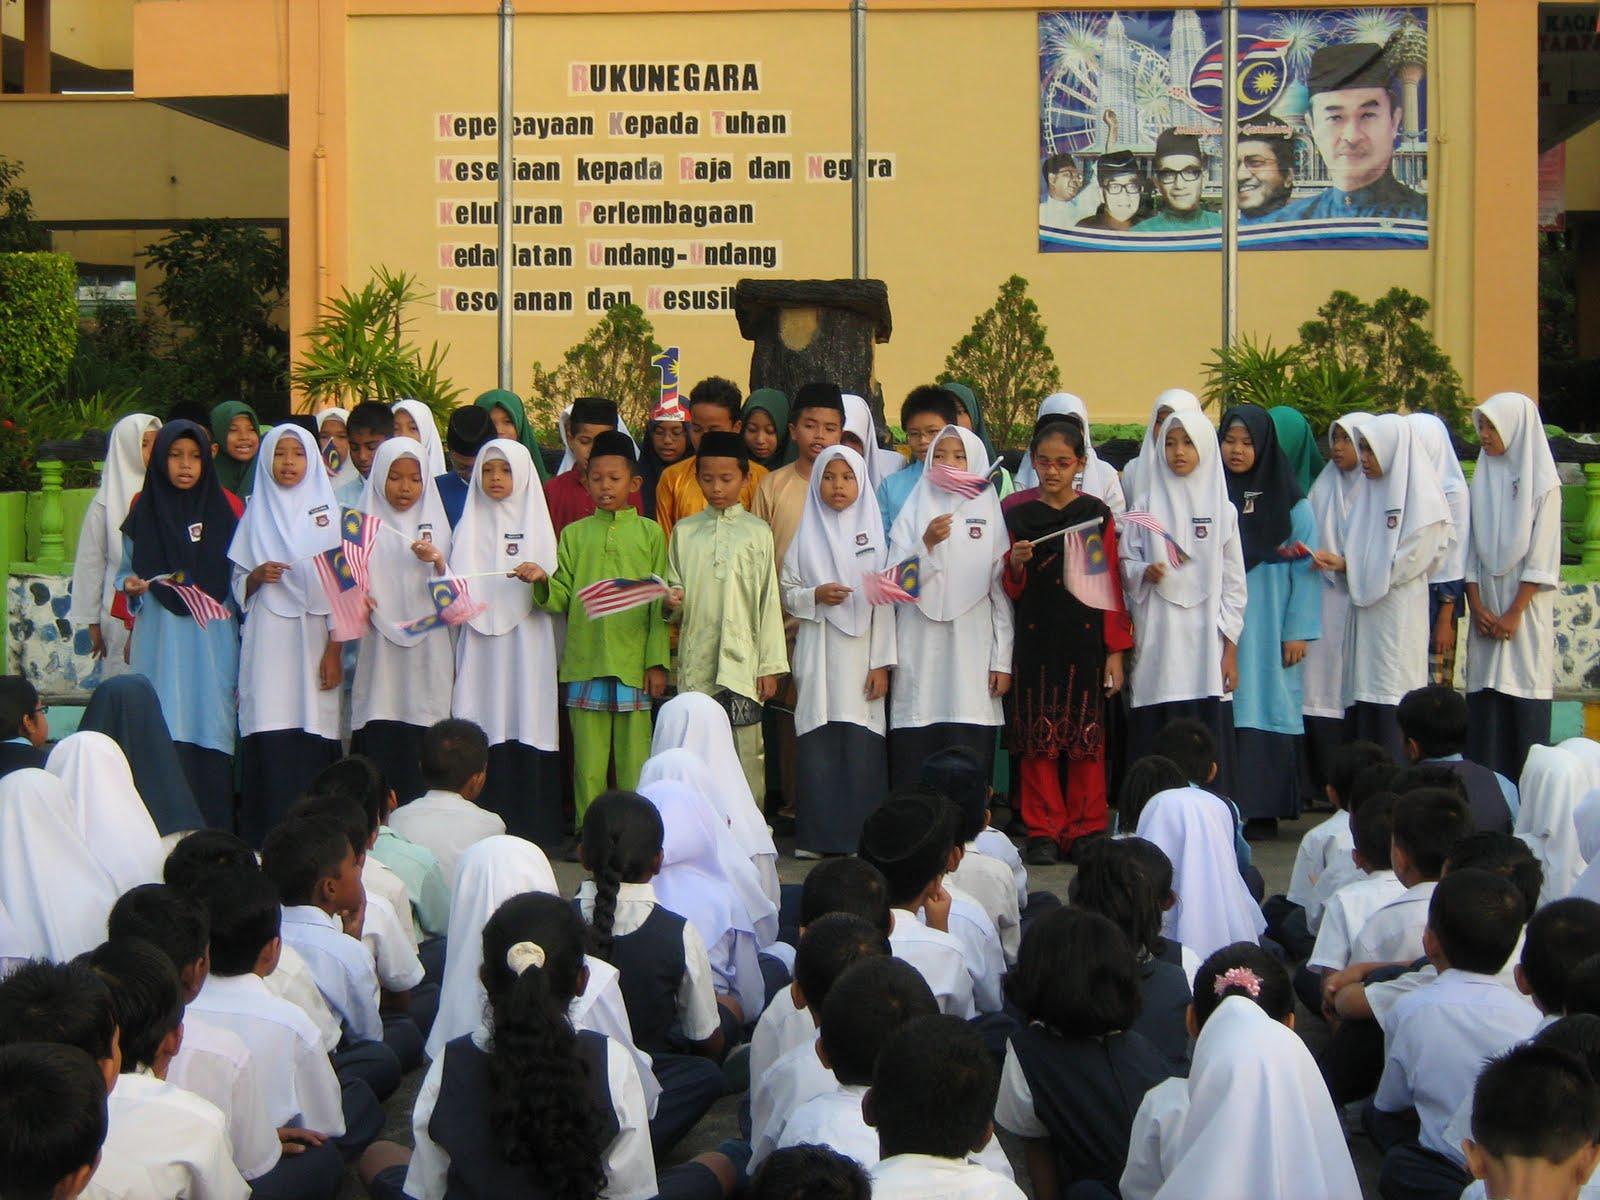 karangan sambutan hari kemerdekaan dalam bahasa malaysia Jelaslah adab menghormati guru merupakan elemen penting dalam memupuk budi bahasa dan adab meraikan sambutan hari guru karangan bahasa melayu.